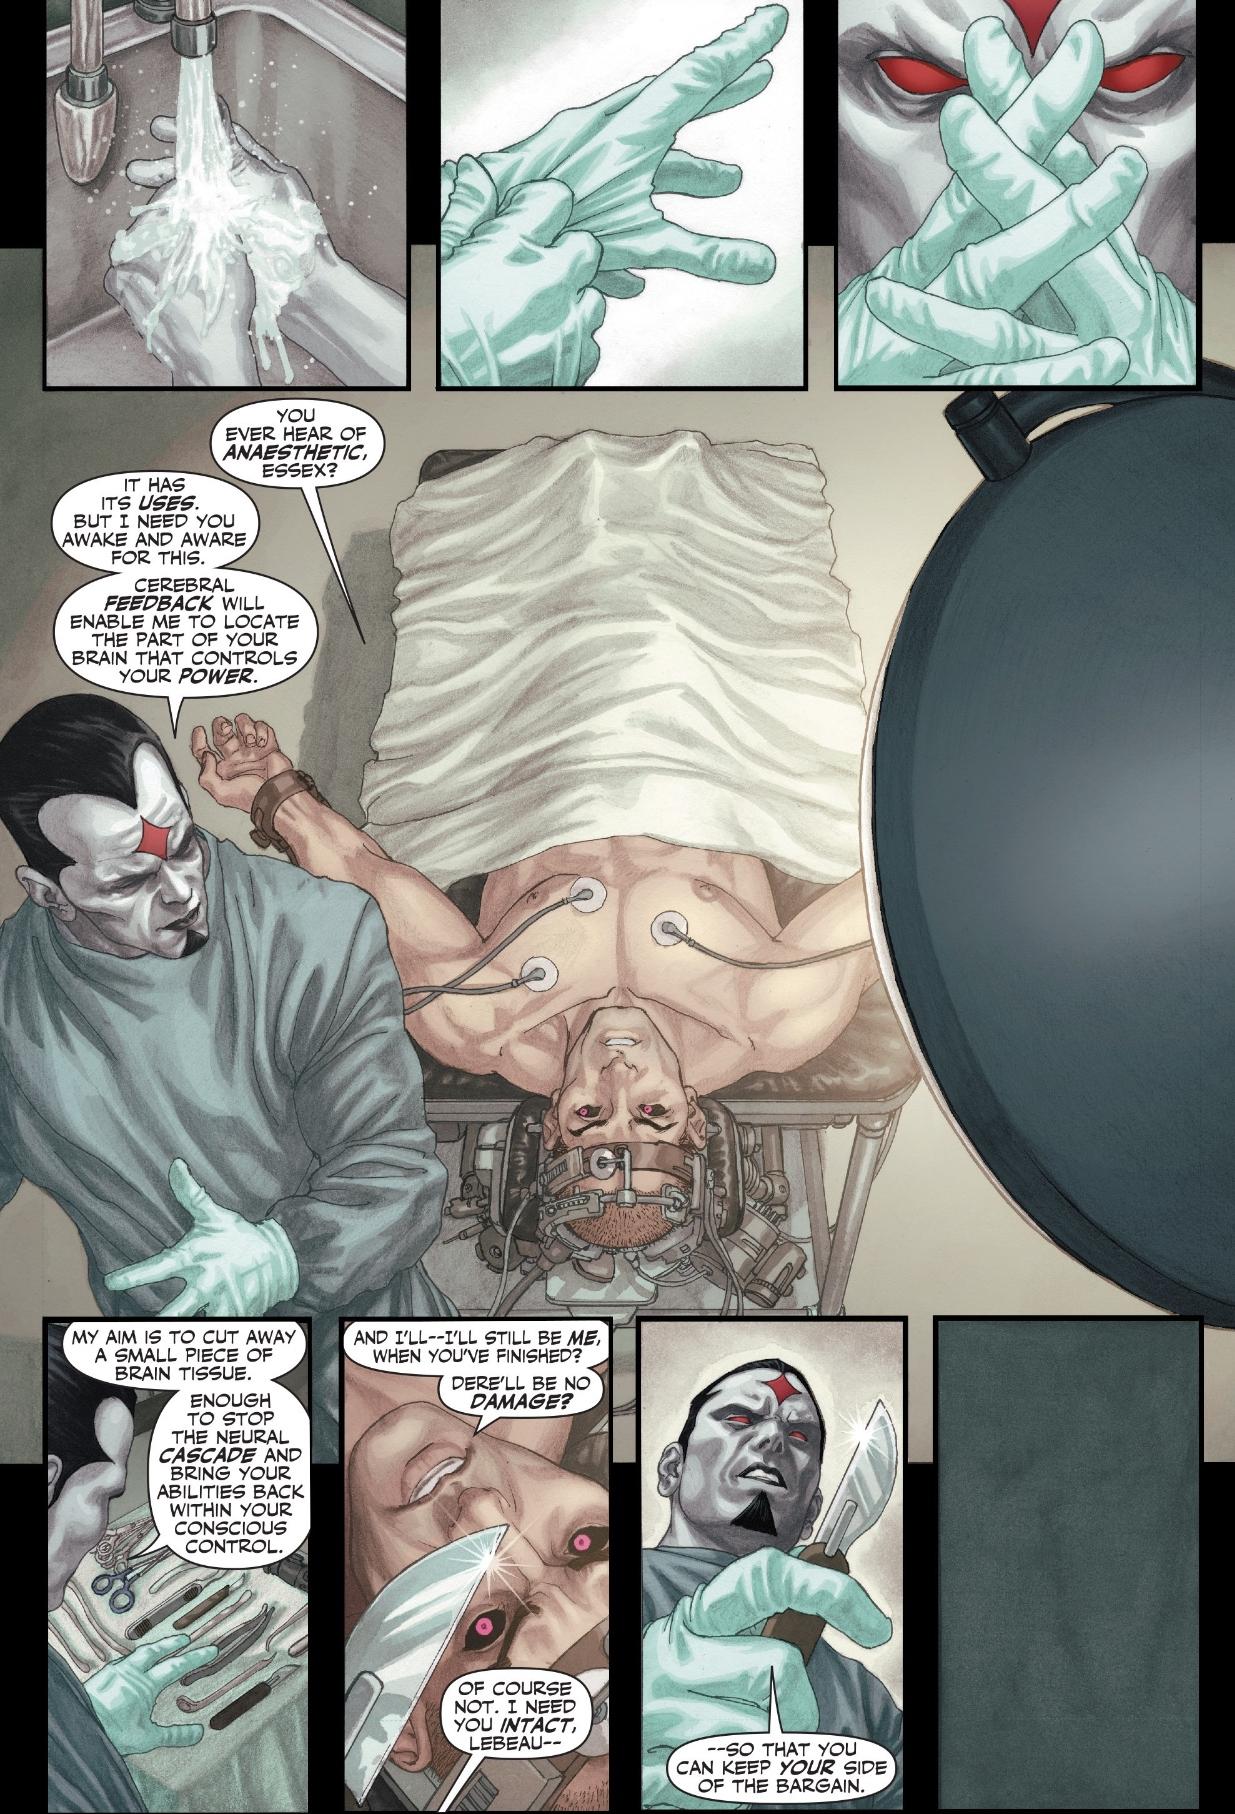 Mr. Sinister removing part of Gambit's brain ( X-Men Origins: Gambit ).